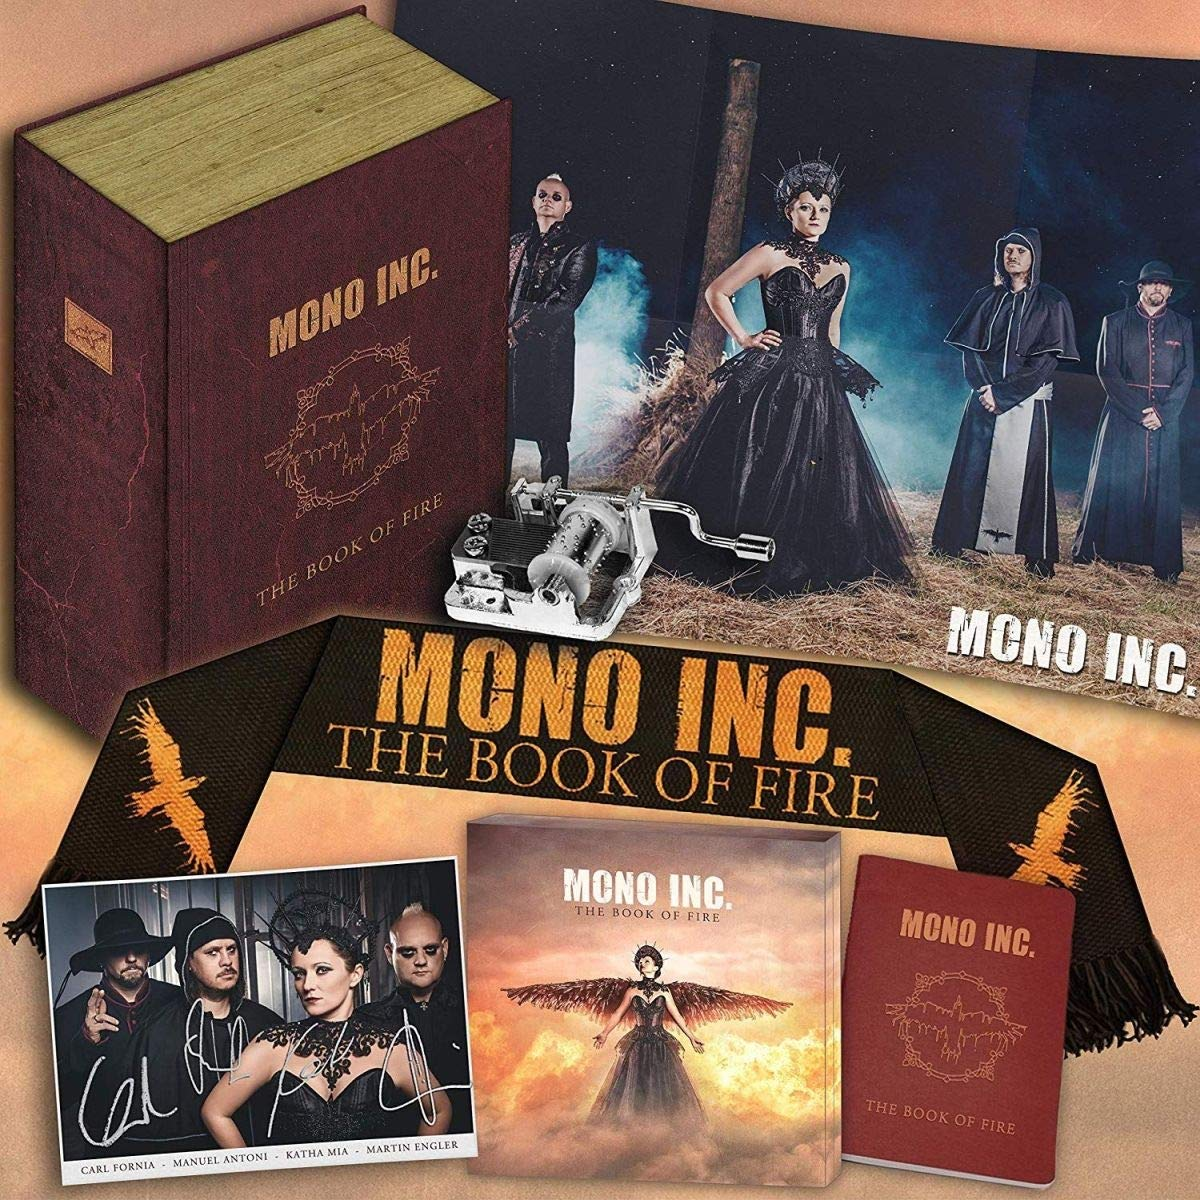 Mono Inc - Mono Inc. - The Book of Fire